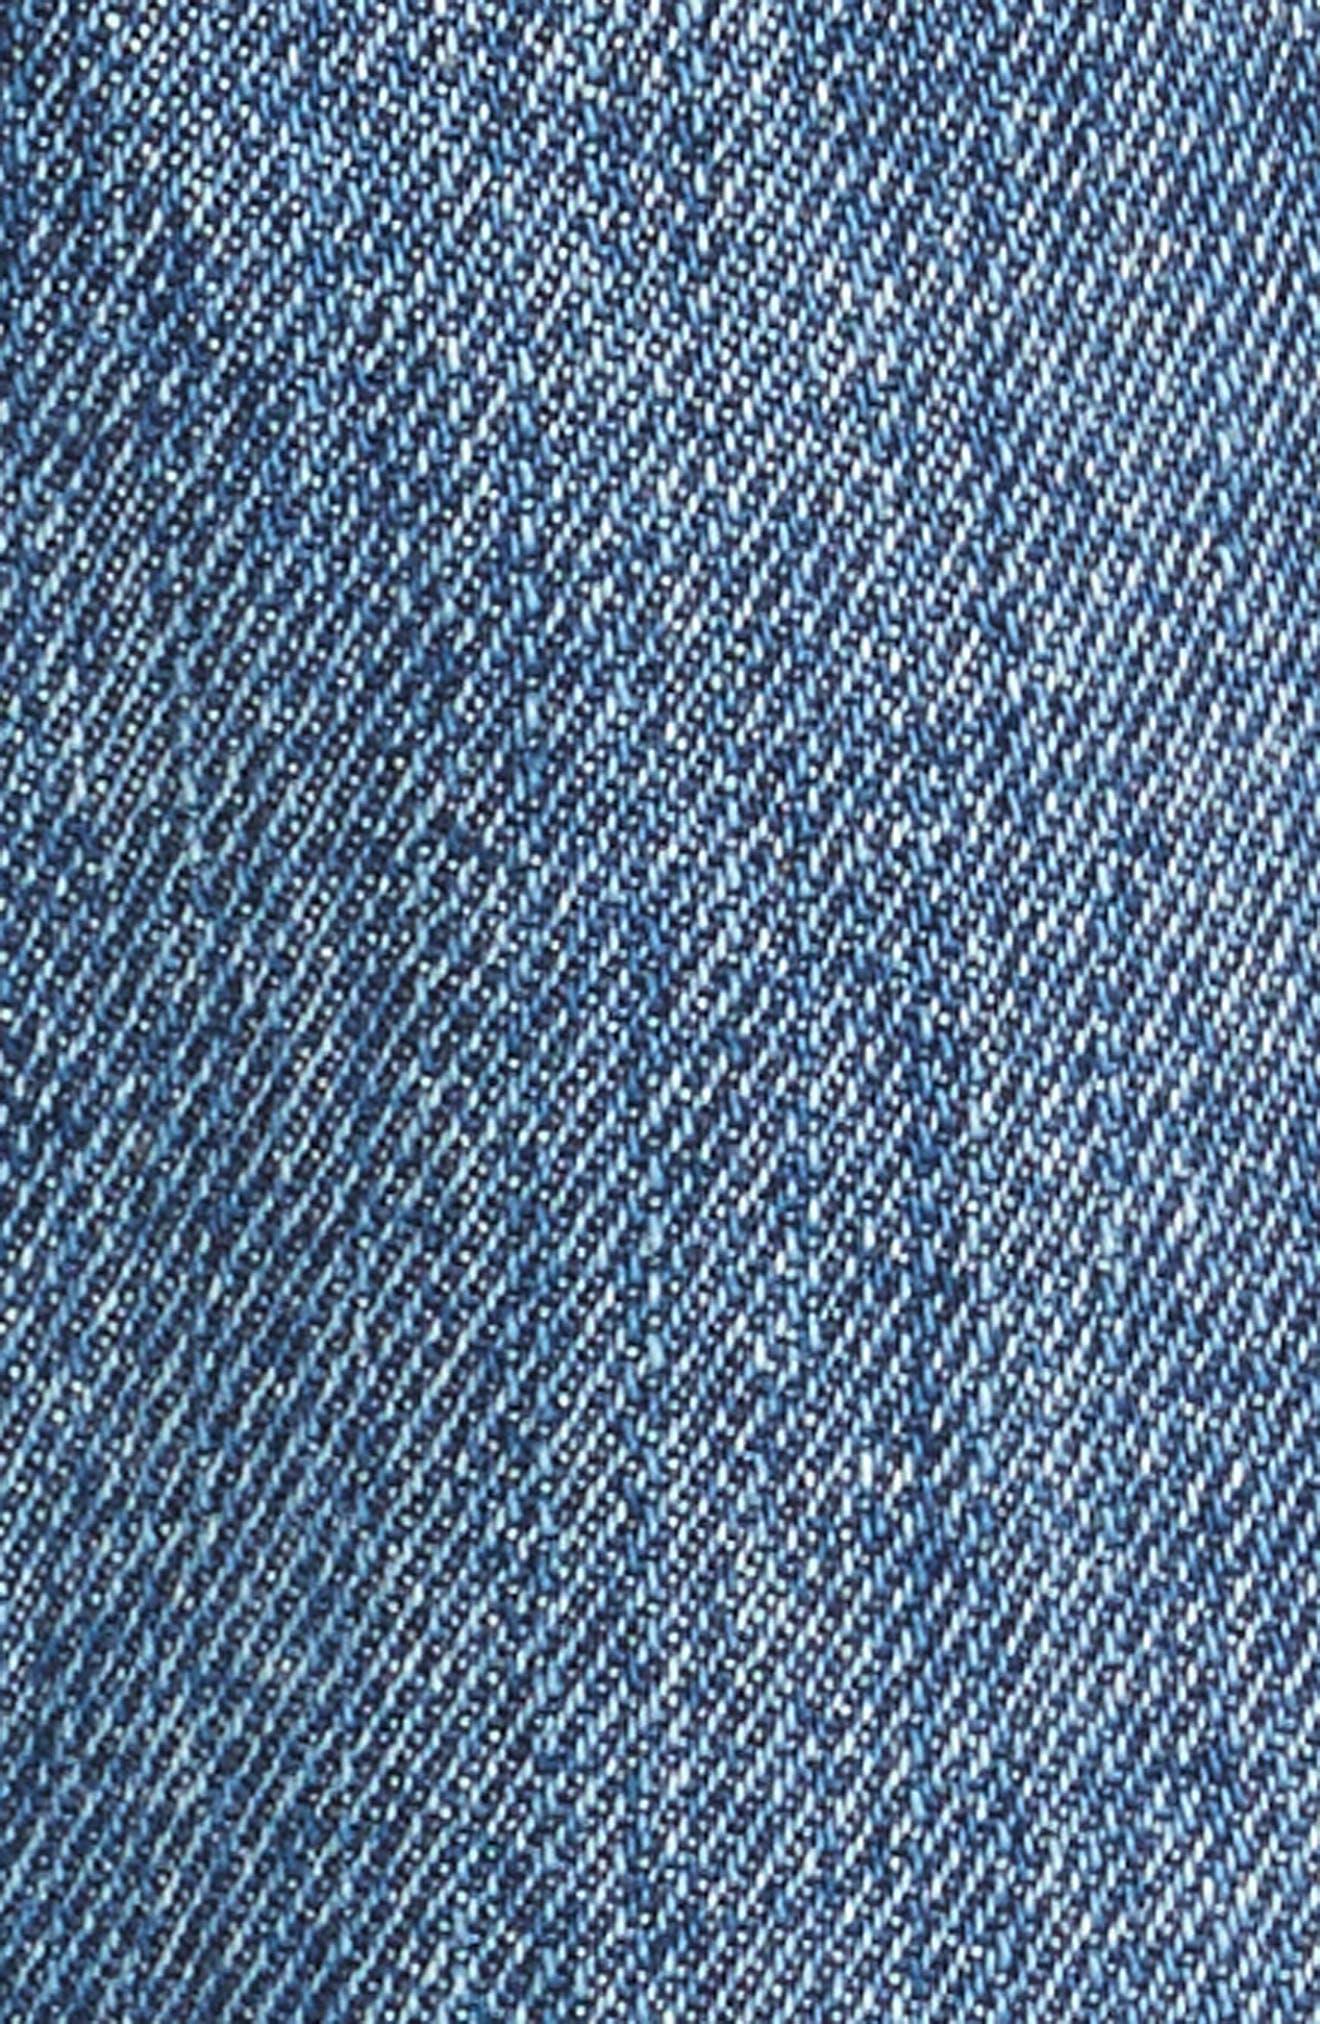 PSWL Cuffed Straight Leg Jeans,                             Alternate thumbnail 7, color,                             MEDIUM BLUE